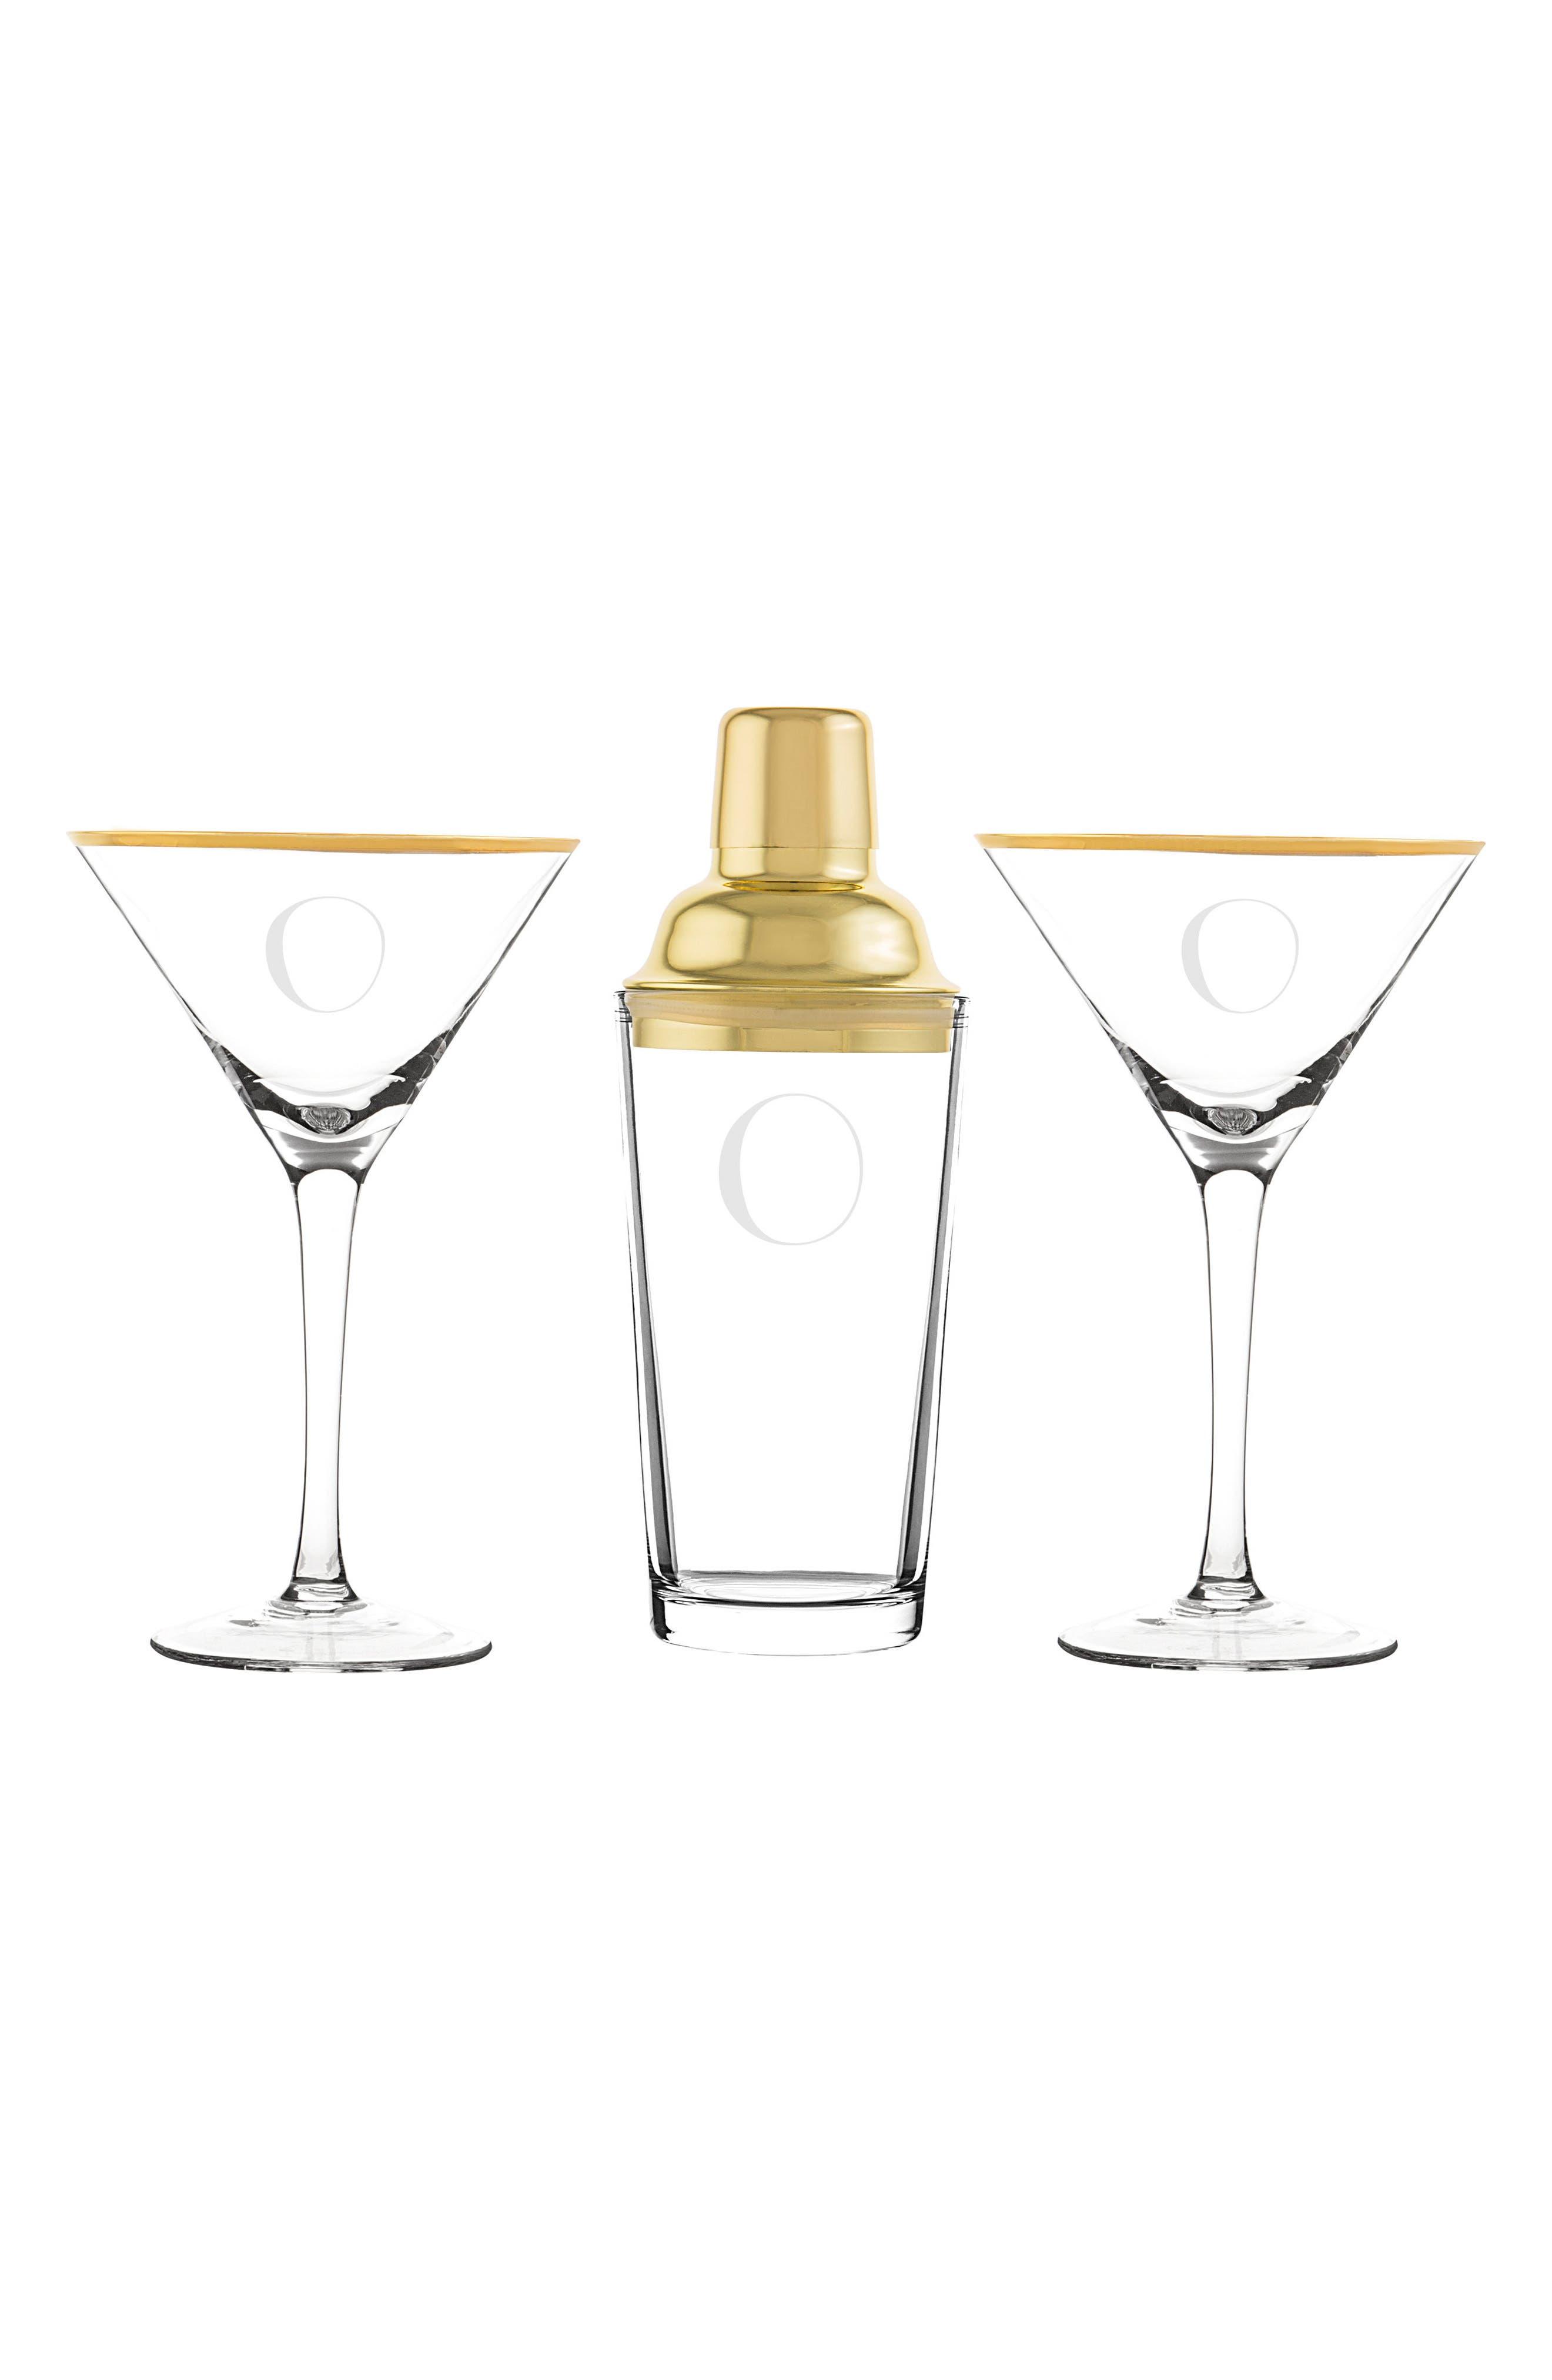 Cathy's Concepts Monogram Martini Glasses & Goldtone Cocktail Shaker